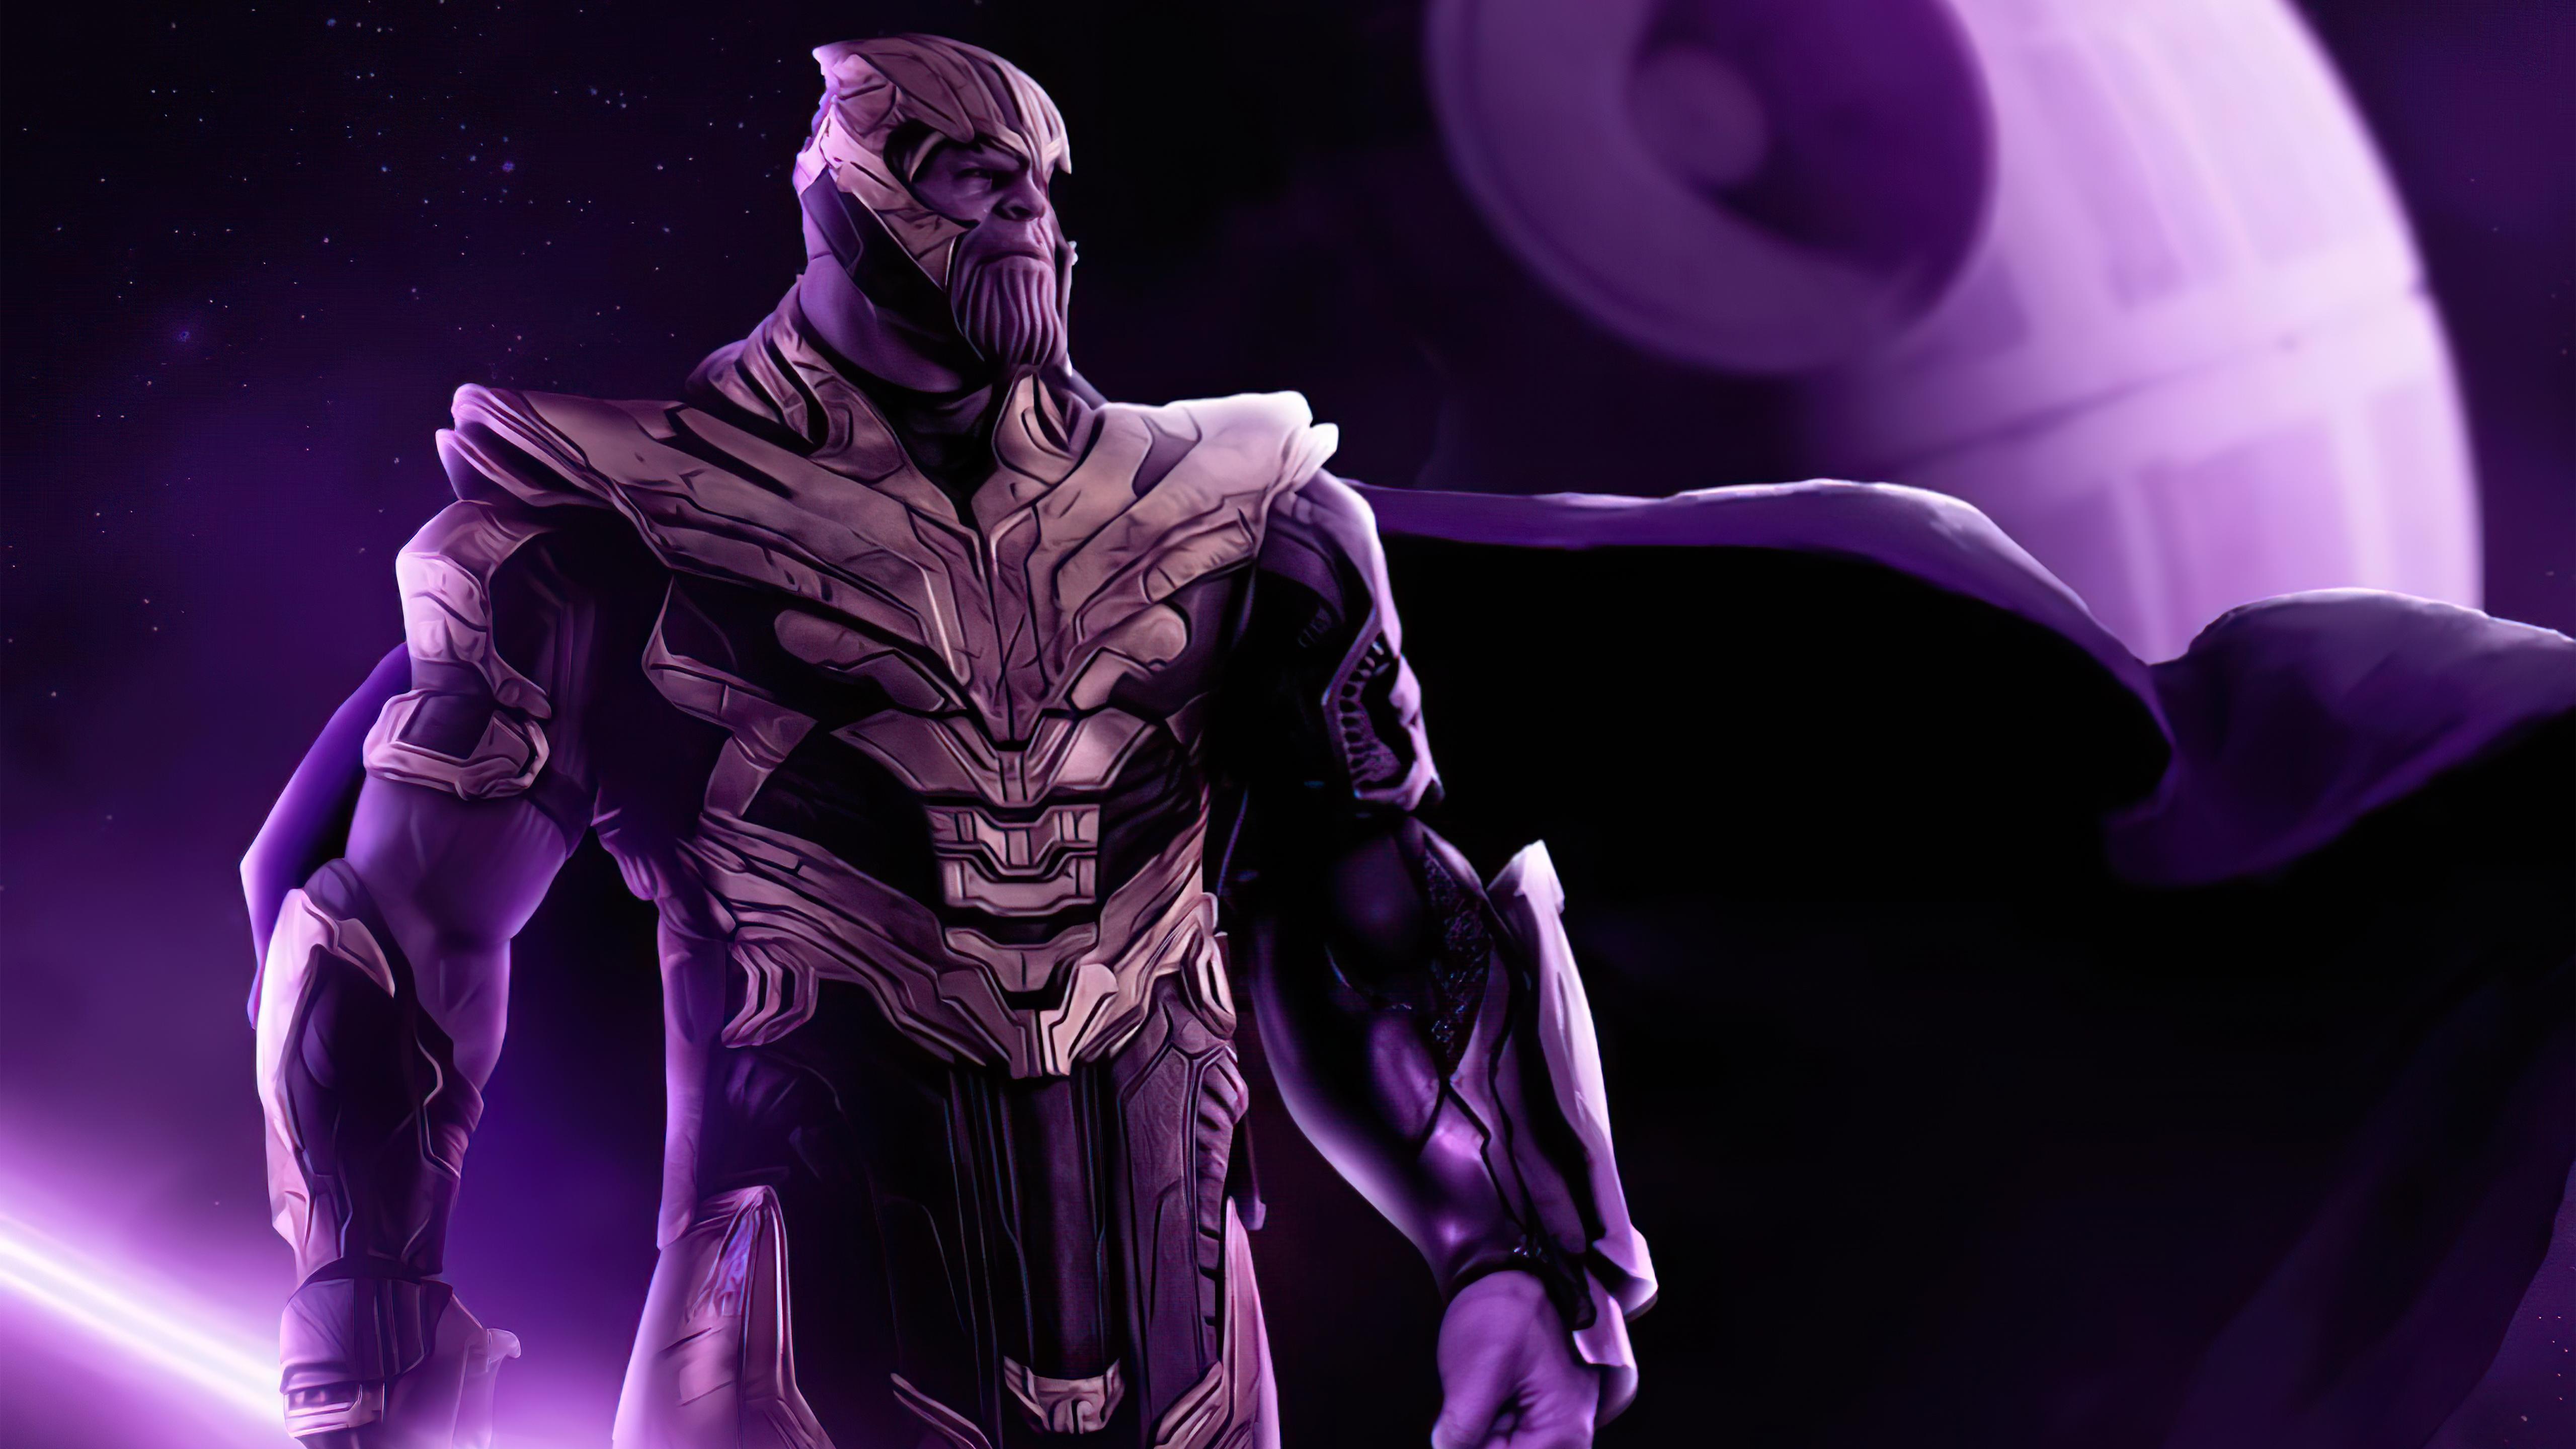 Wallpaper Thanos x Star Wars